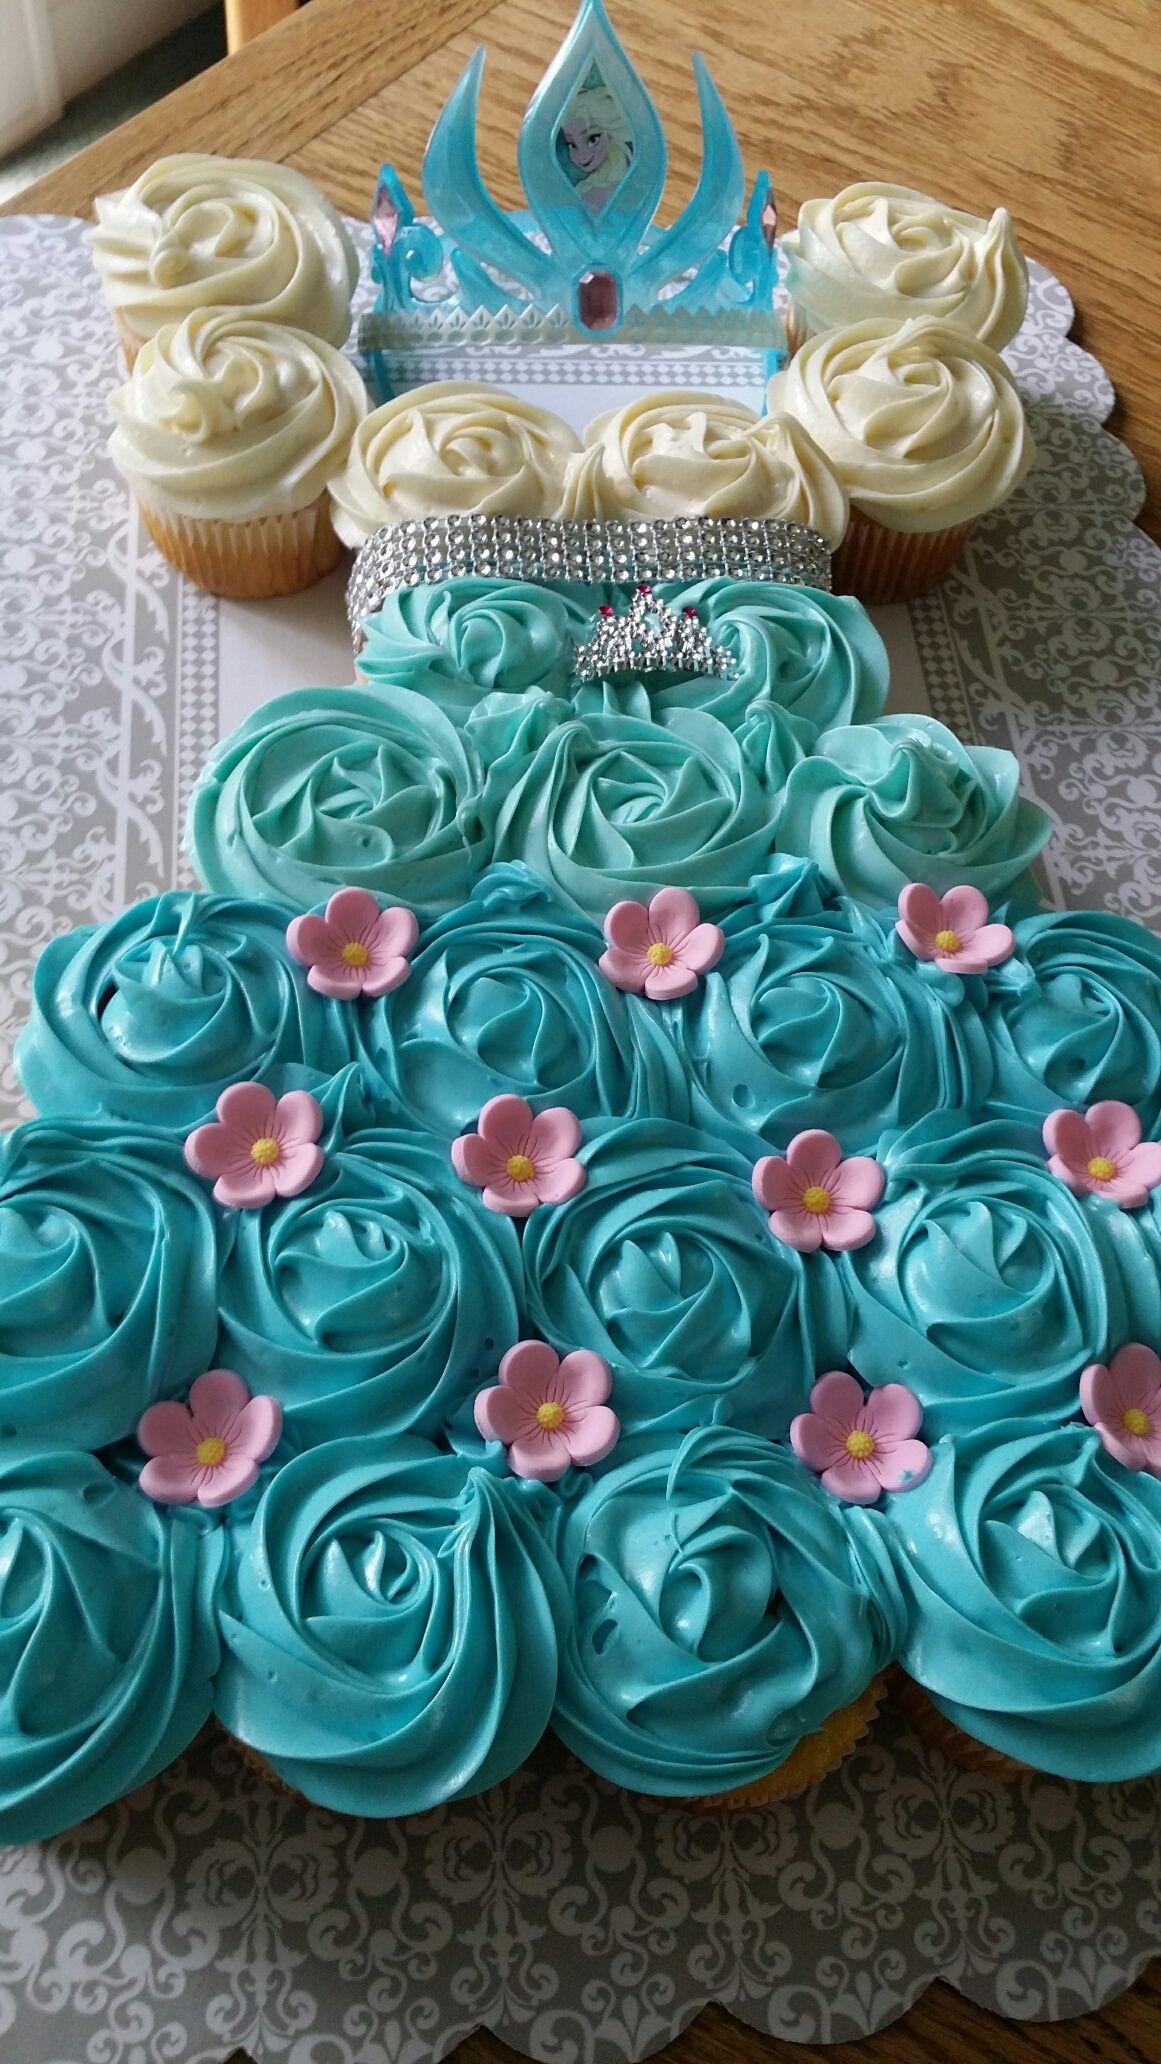 Surprising Frozen Fever Elsa Dress Cupcake Cake Cupcake Dress Cake Frozen Funny Birthday Cards Online Inifodamsfinfo